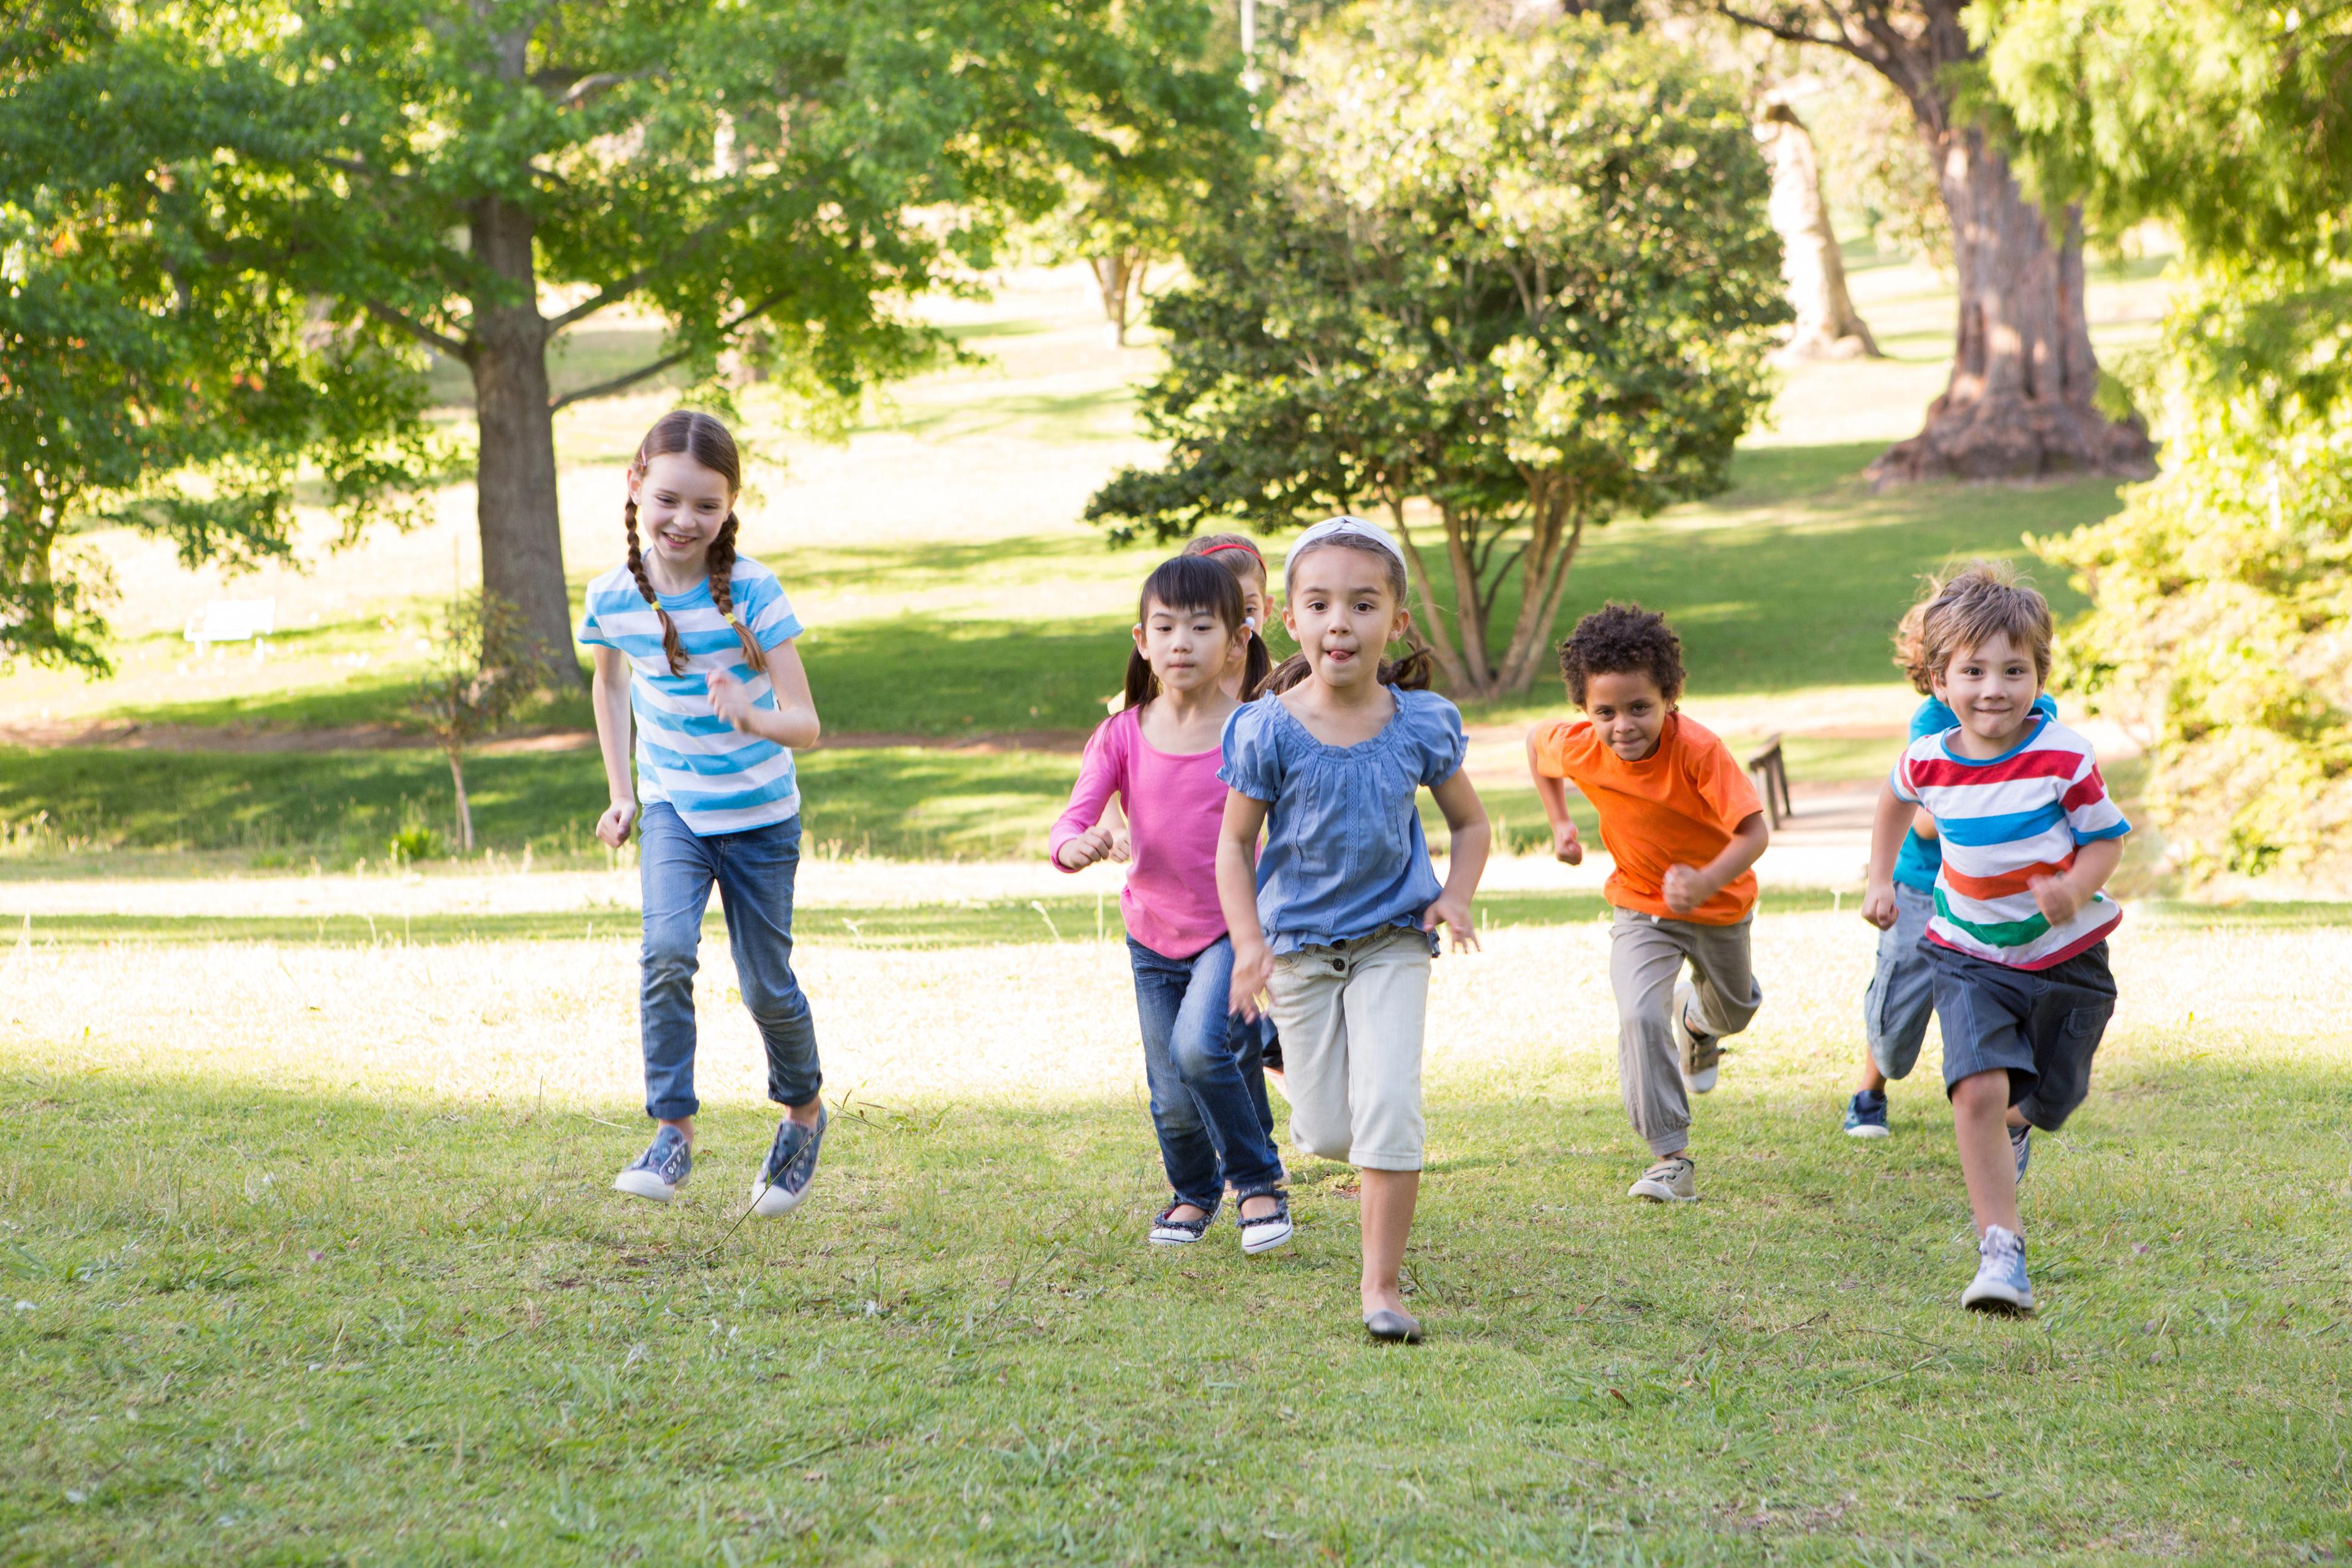 active living - children running in park